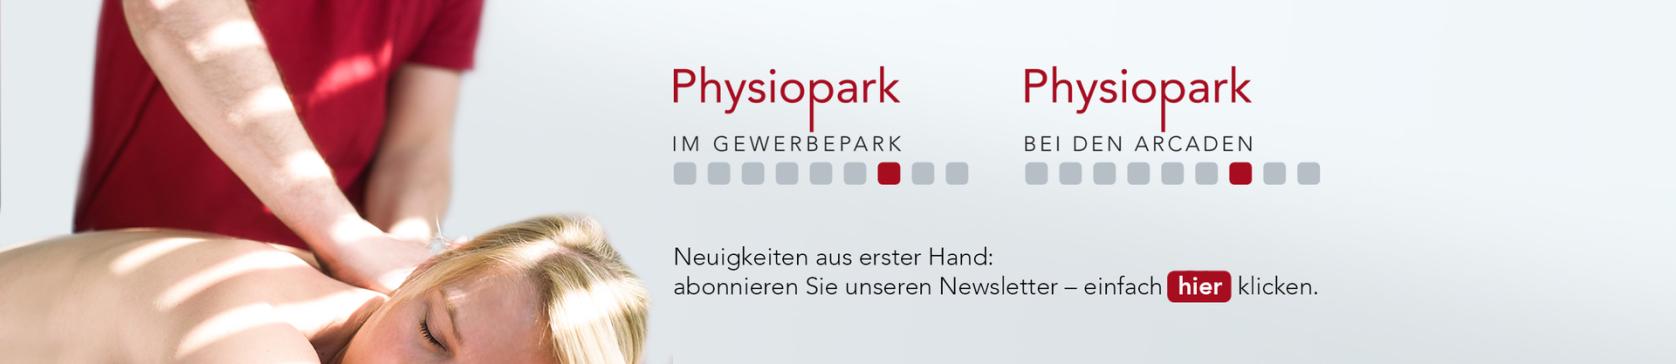 Physiopark, Praxis im Gewerbepark, Regensburg